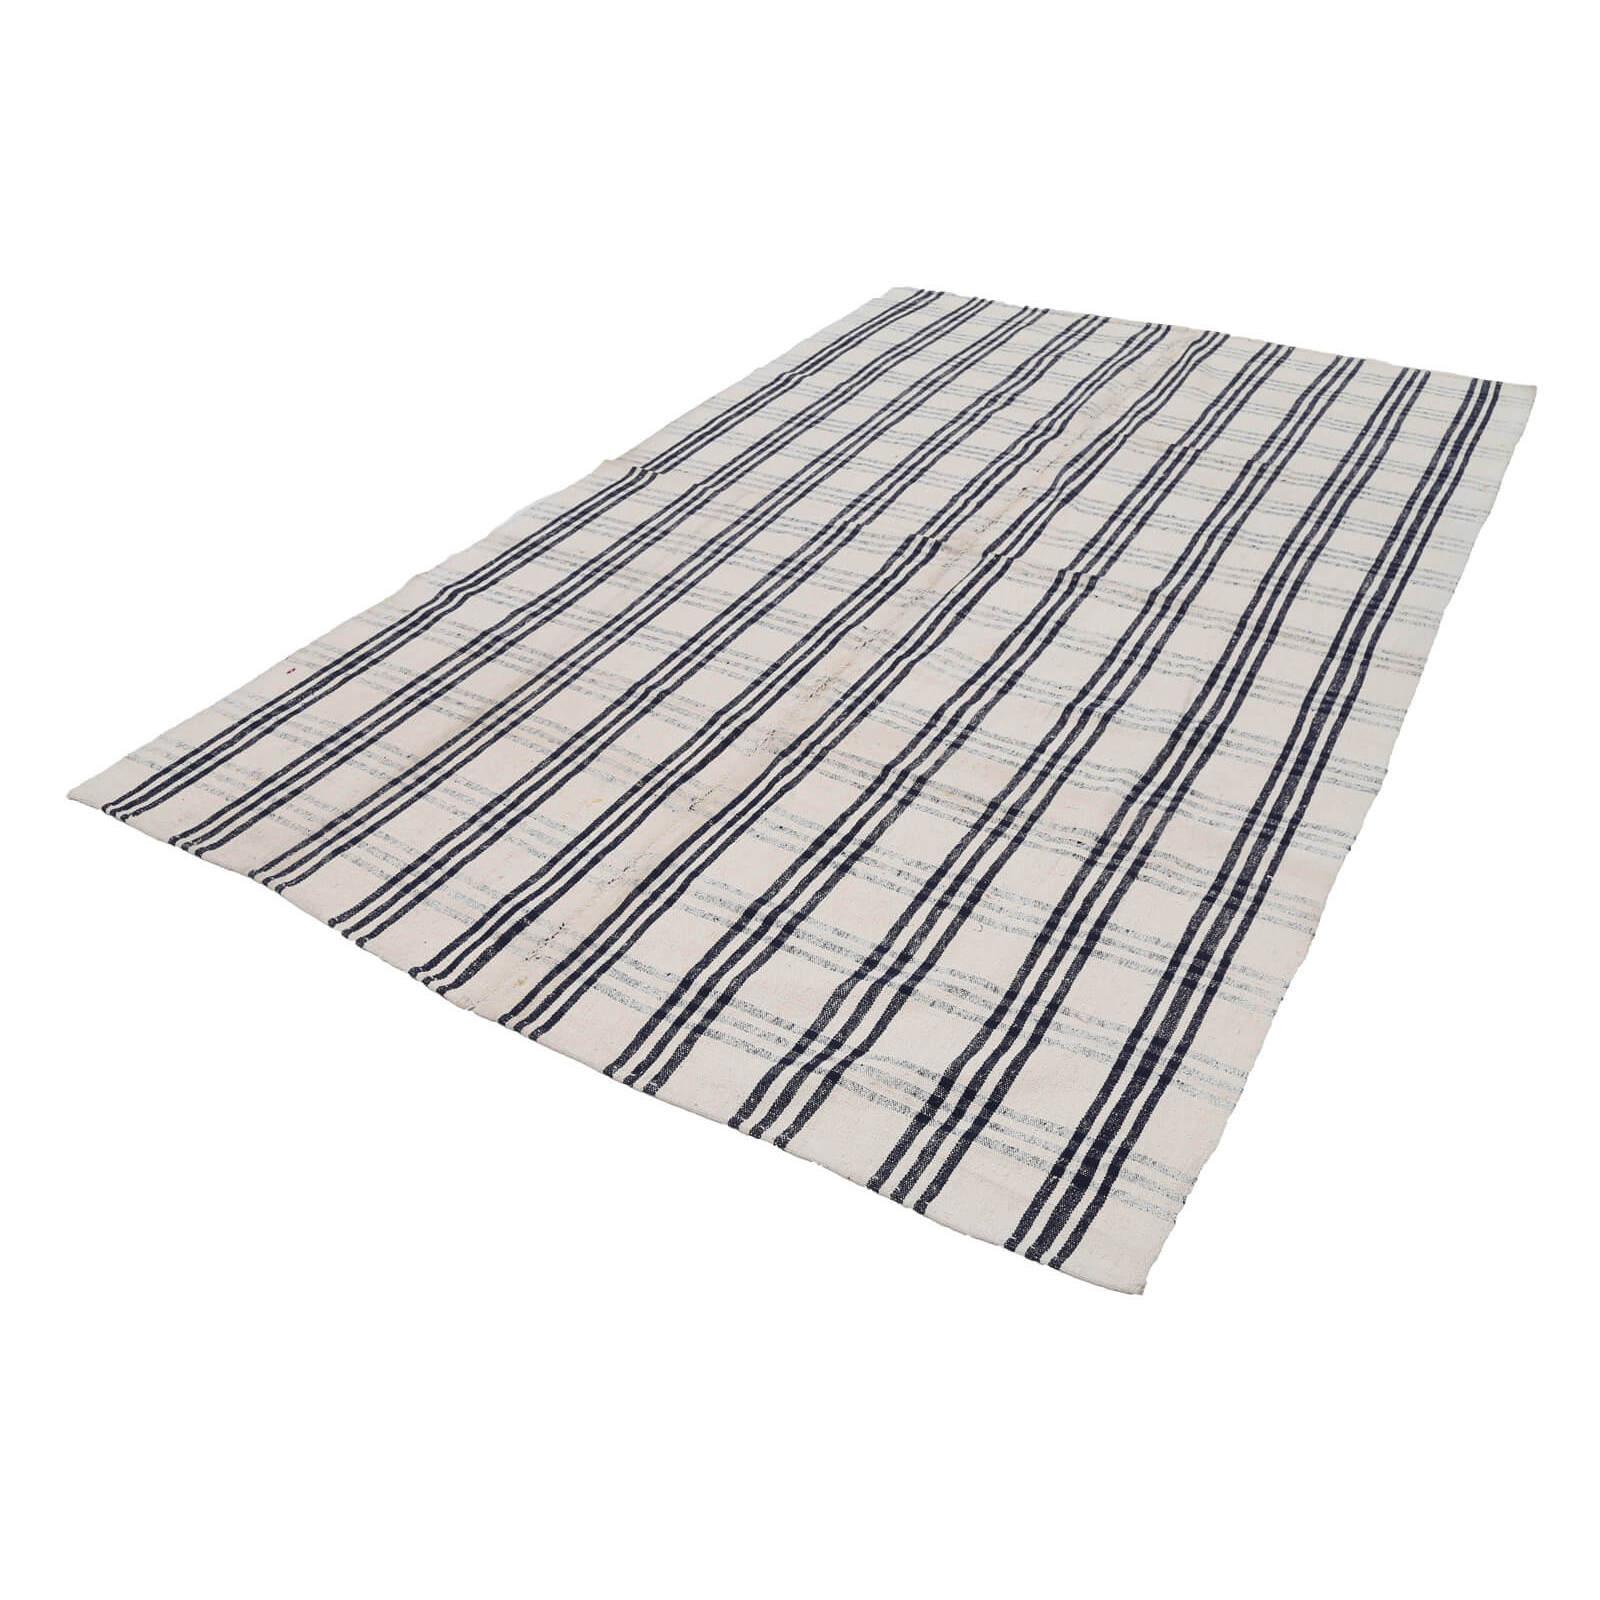 205x323 Cm alfombra Oriental Beige hecha a mano Rug-7x11 pies